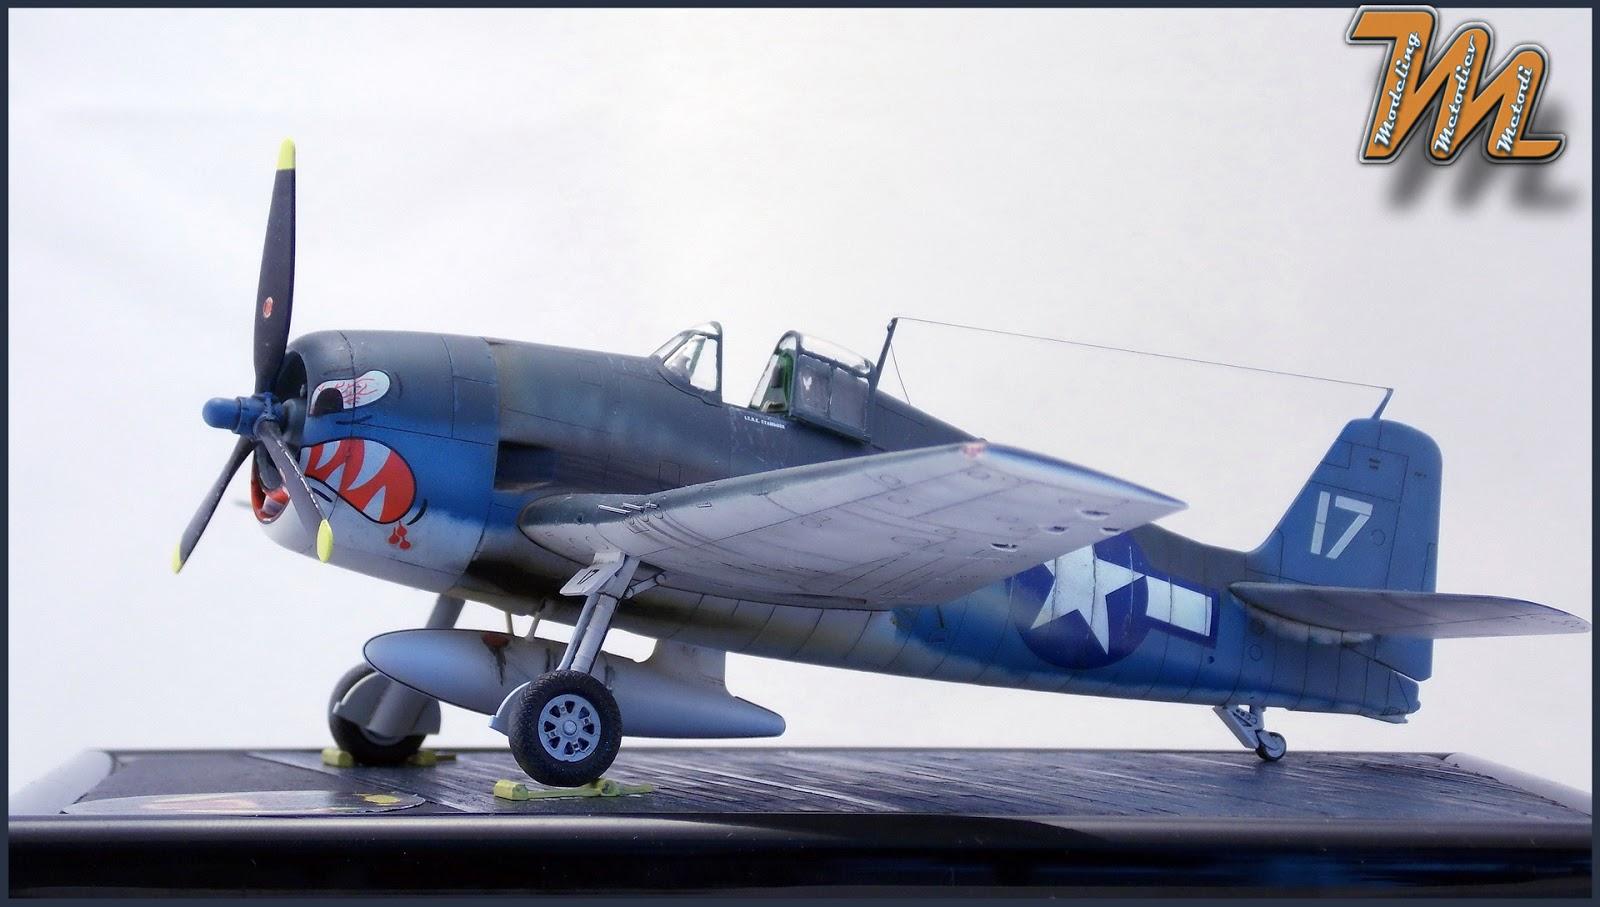 F6F-3, Hellcat, VF-2, scale model